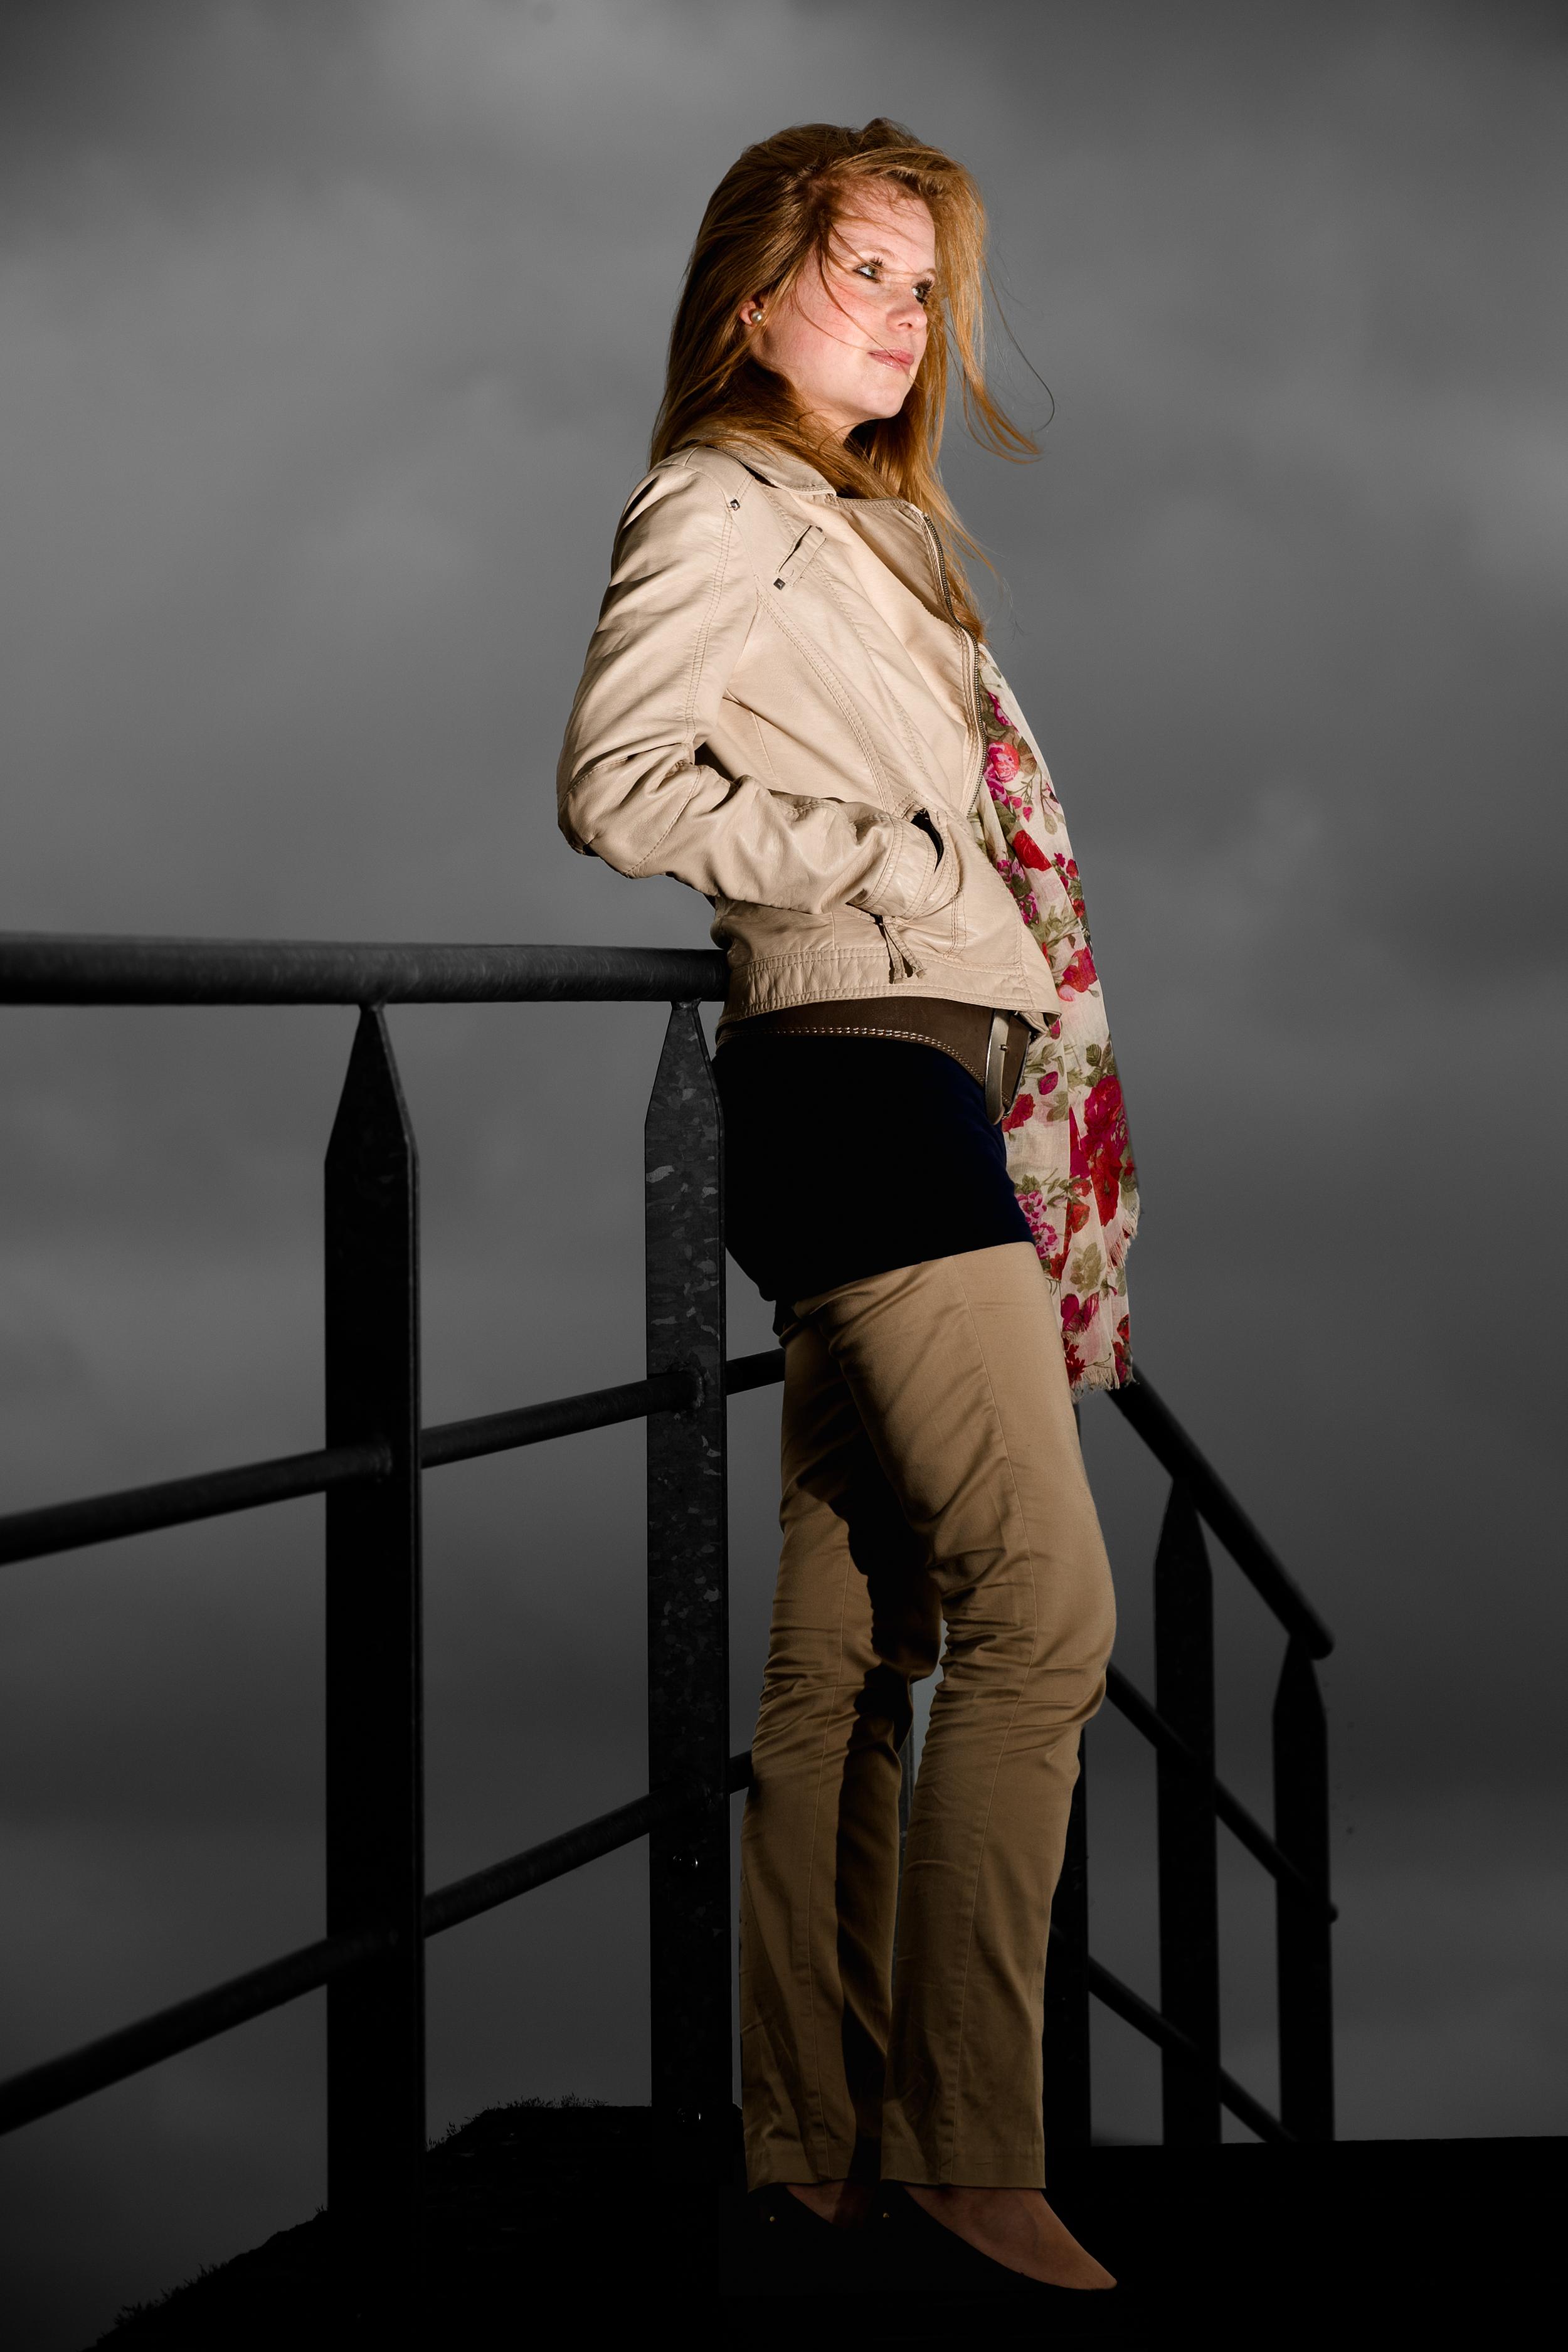 Portret_Jenny_Boschmolenplas_20110330_0062-Edit.jpg